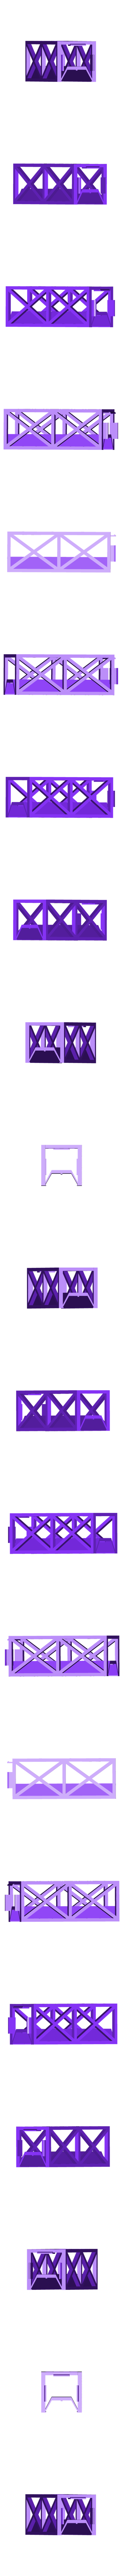 LBLUC_segment_straight_onepiece_160916.stl Download free STL file Led bridge lamp Universal Segment • 3D printable design, Opossums